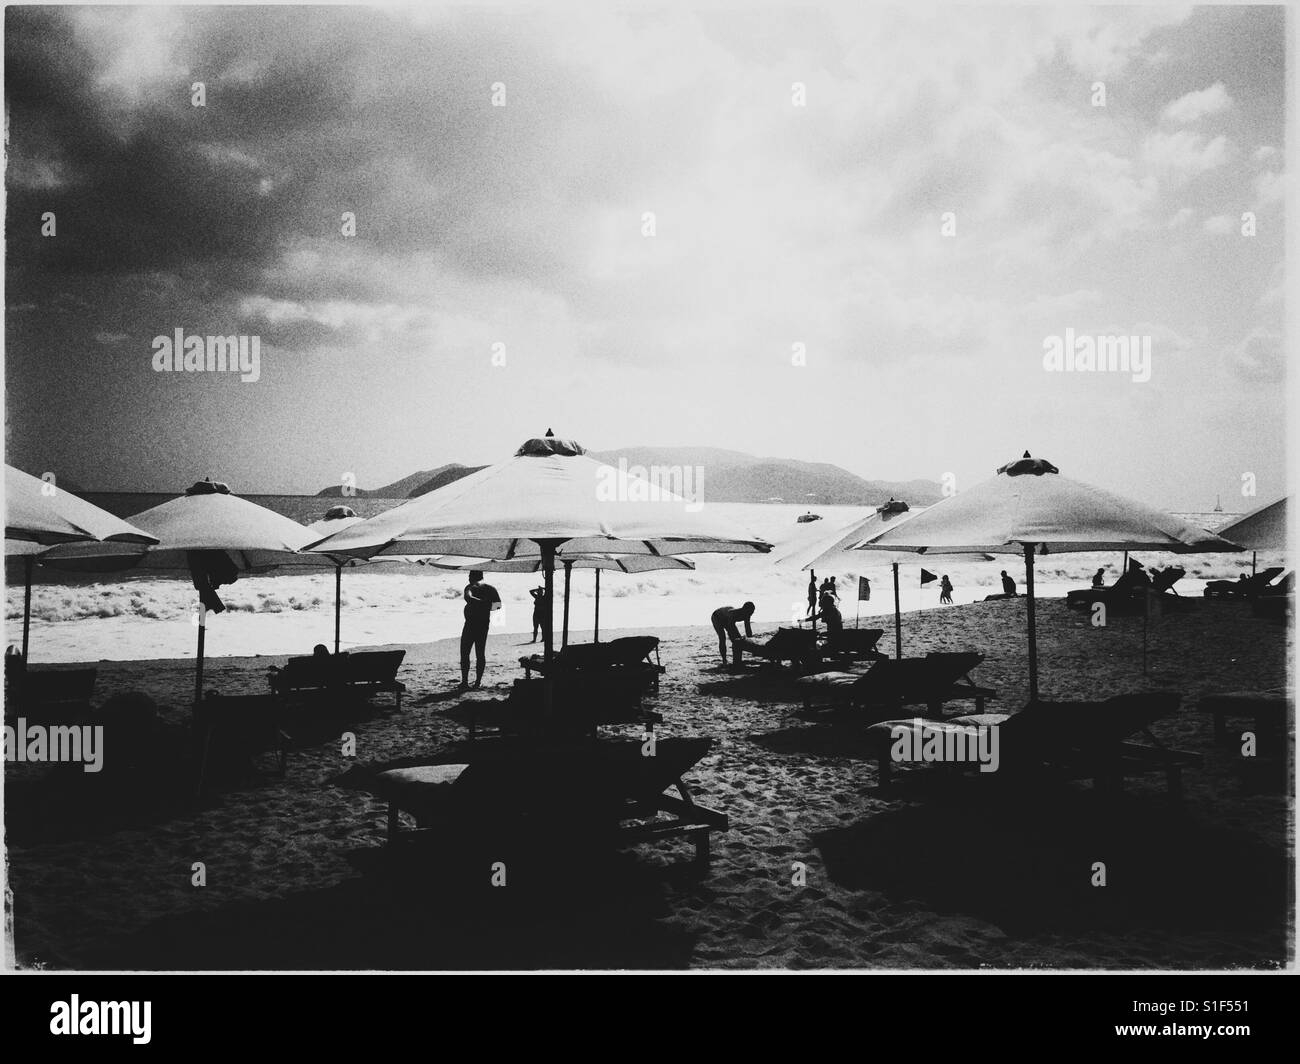 Nha trang beach line. - Stock Image